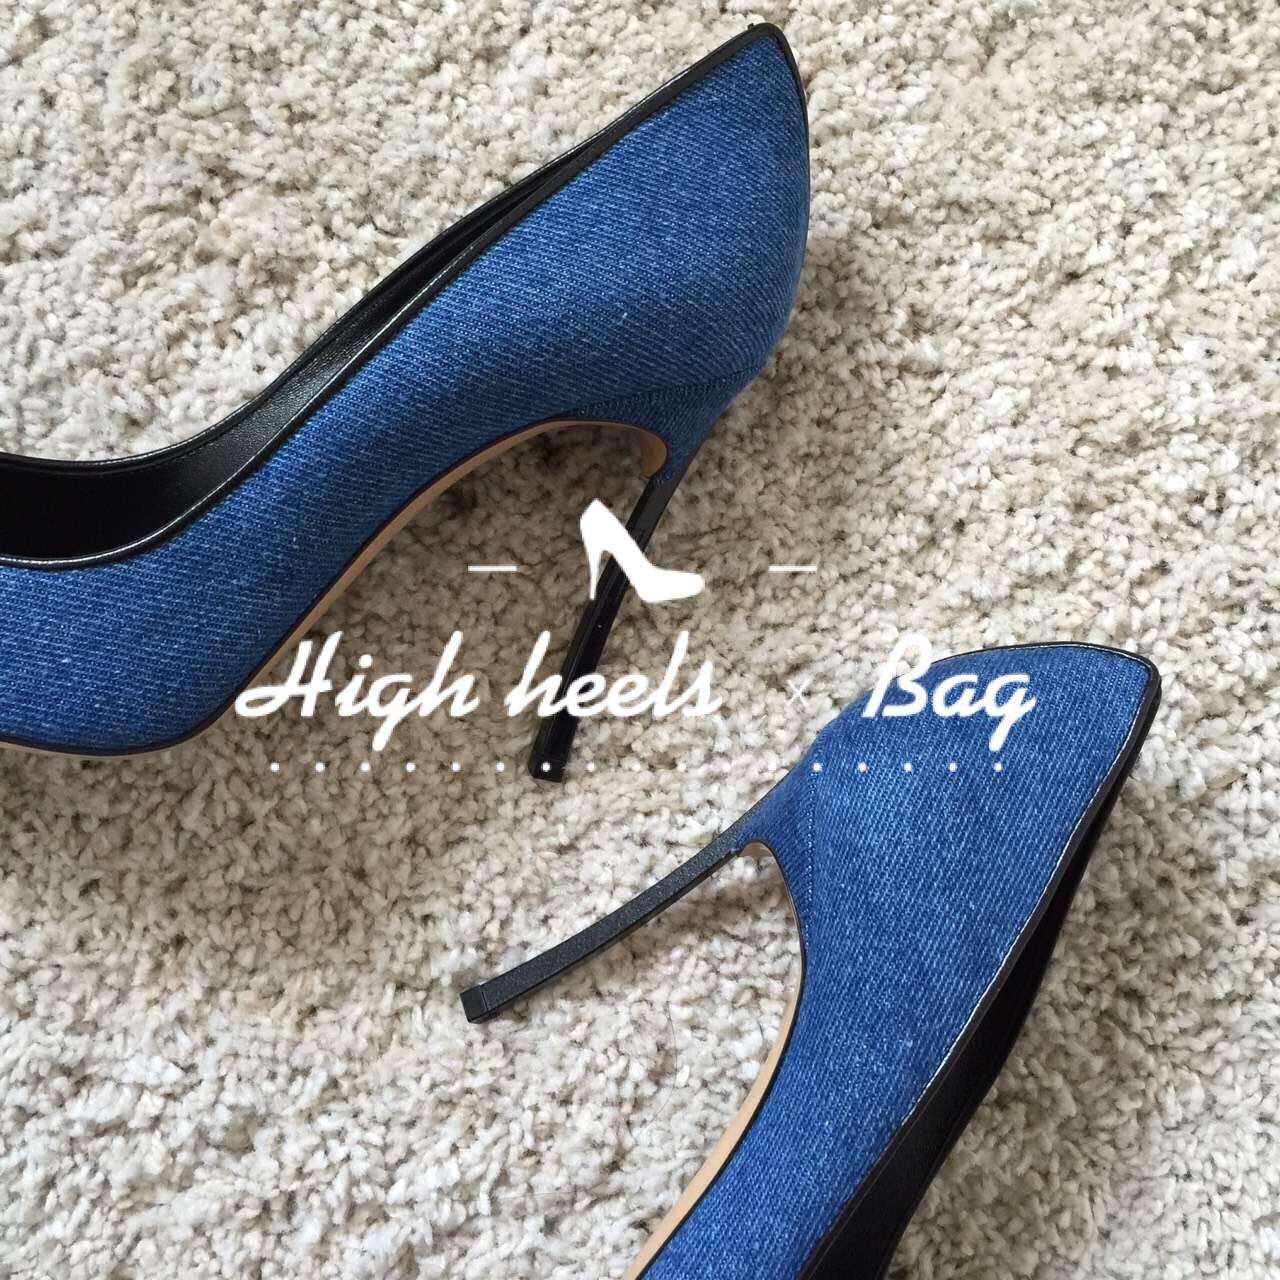 CASADEI的鞋子里觉得刀锋款最有味道,我的鞋子里只有细高跟和平跟,经典款的黑色红色也很有味道,鞋型也很大气。 这双属于牛仔款,布面的,脚感不错,我的脚属于比较窄瘦的类型,所以尖头鞋适合我。脚宽的mm不推荐噢。 关于这个品牌呢其实在意大利是个很知名的牌子了,全手工缝制和原创设计的品牌,还有个红地毯系列很有名。 @薯队长 改好了。 无聊来说说上周六看了杨丽萍导的《十面埋伏》,是舞剧,也只是舞剧。 我基本现在是不看商业剧的,有些东西的确是矛盾的:比如纯爱好和想赚钱;比如生存所迫和这是我想要